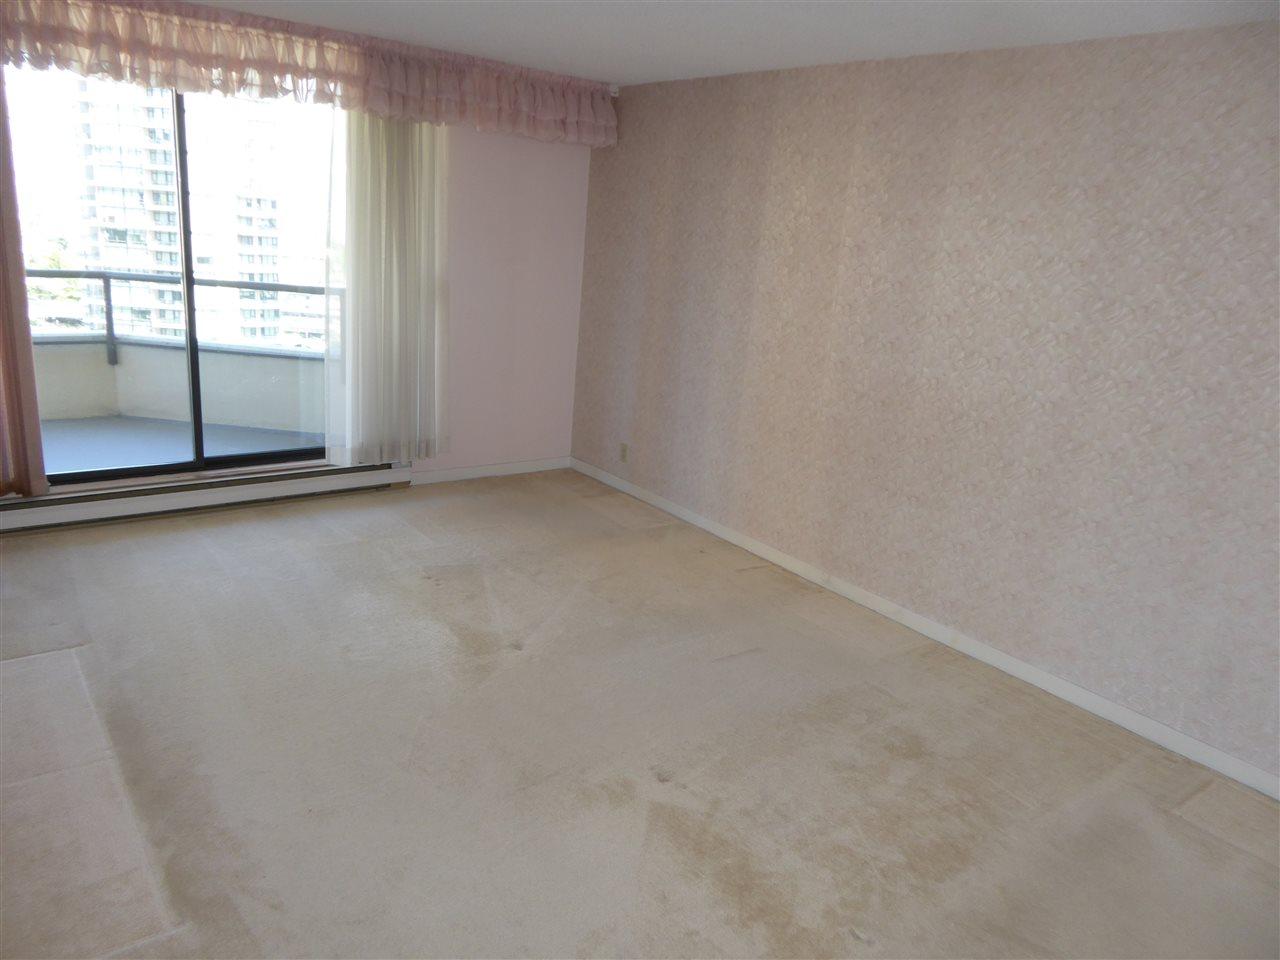 Condo Apartment at 1603 6282 KATHLEEN AVENUE, Unit 1603, Burnaby South, British Columbia. Image 13